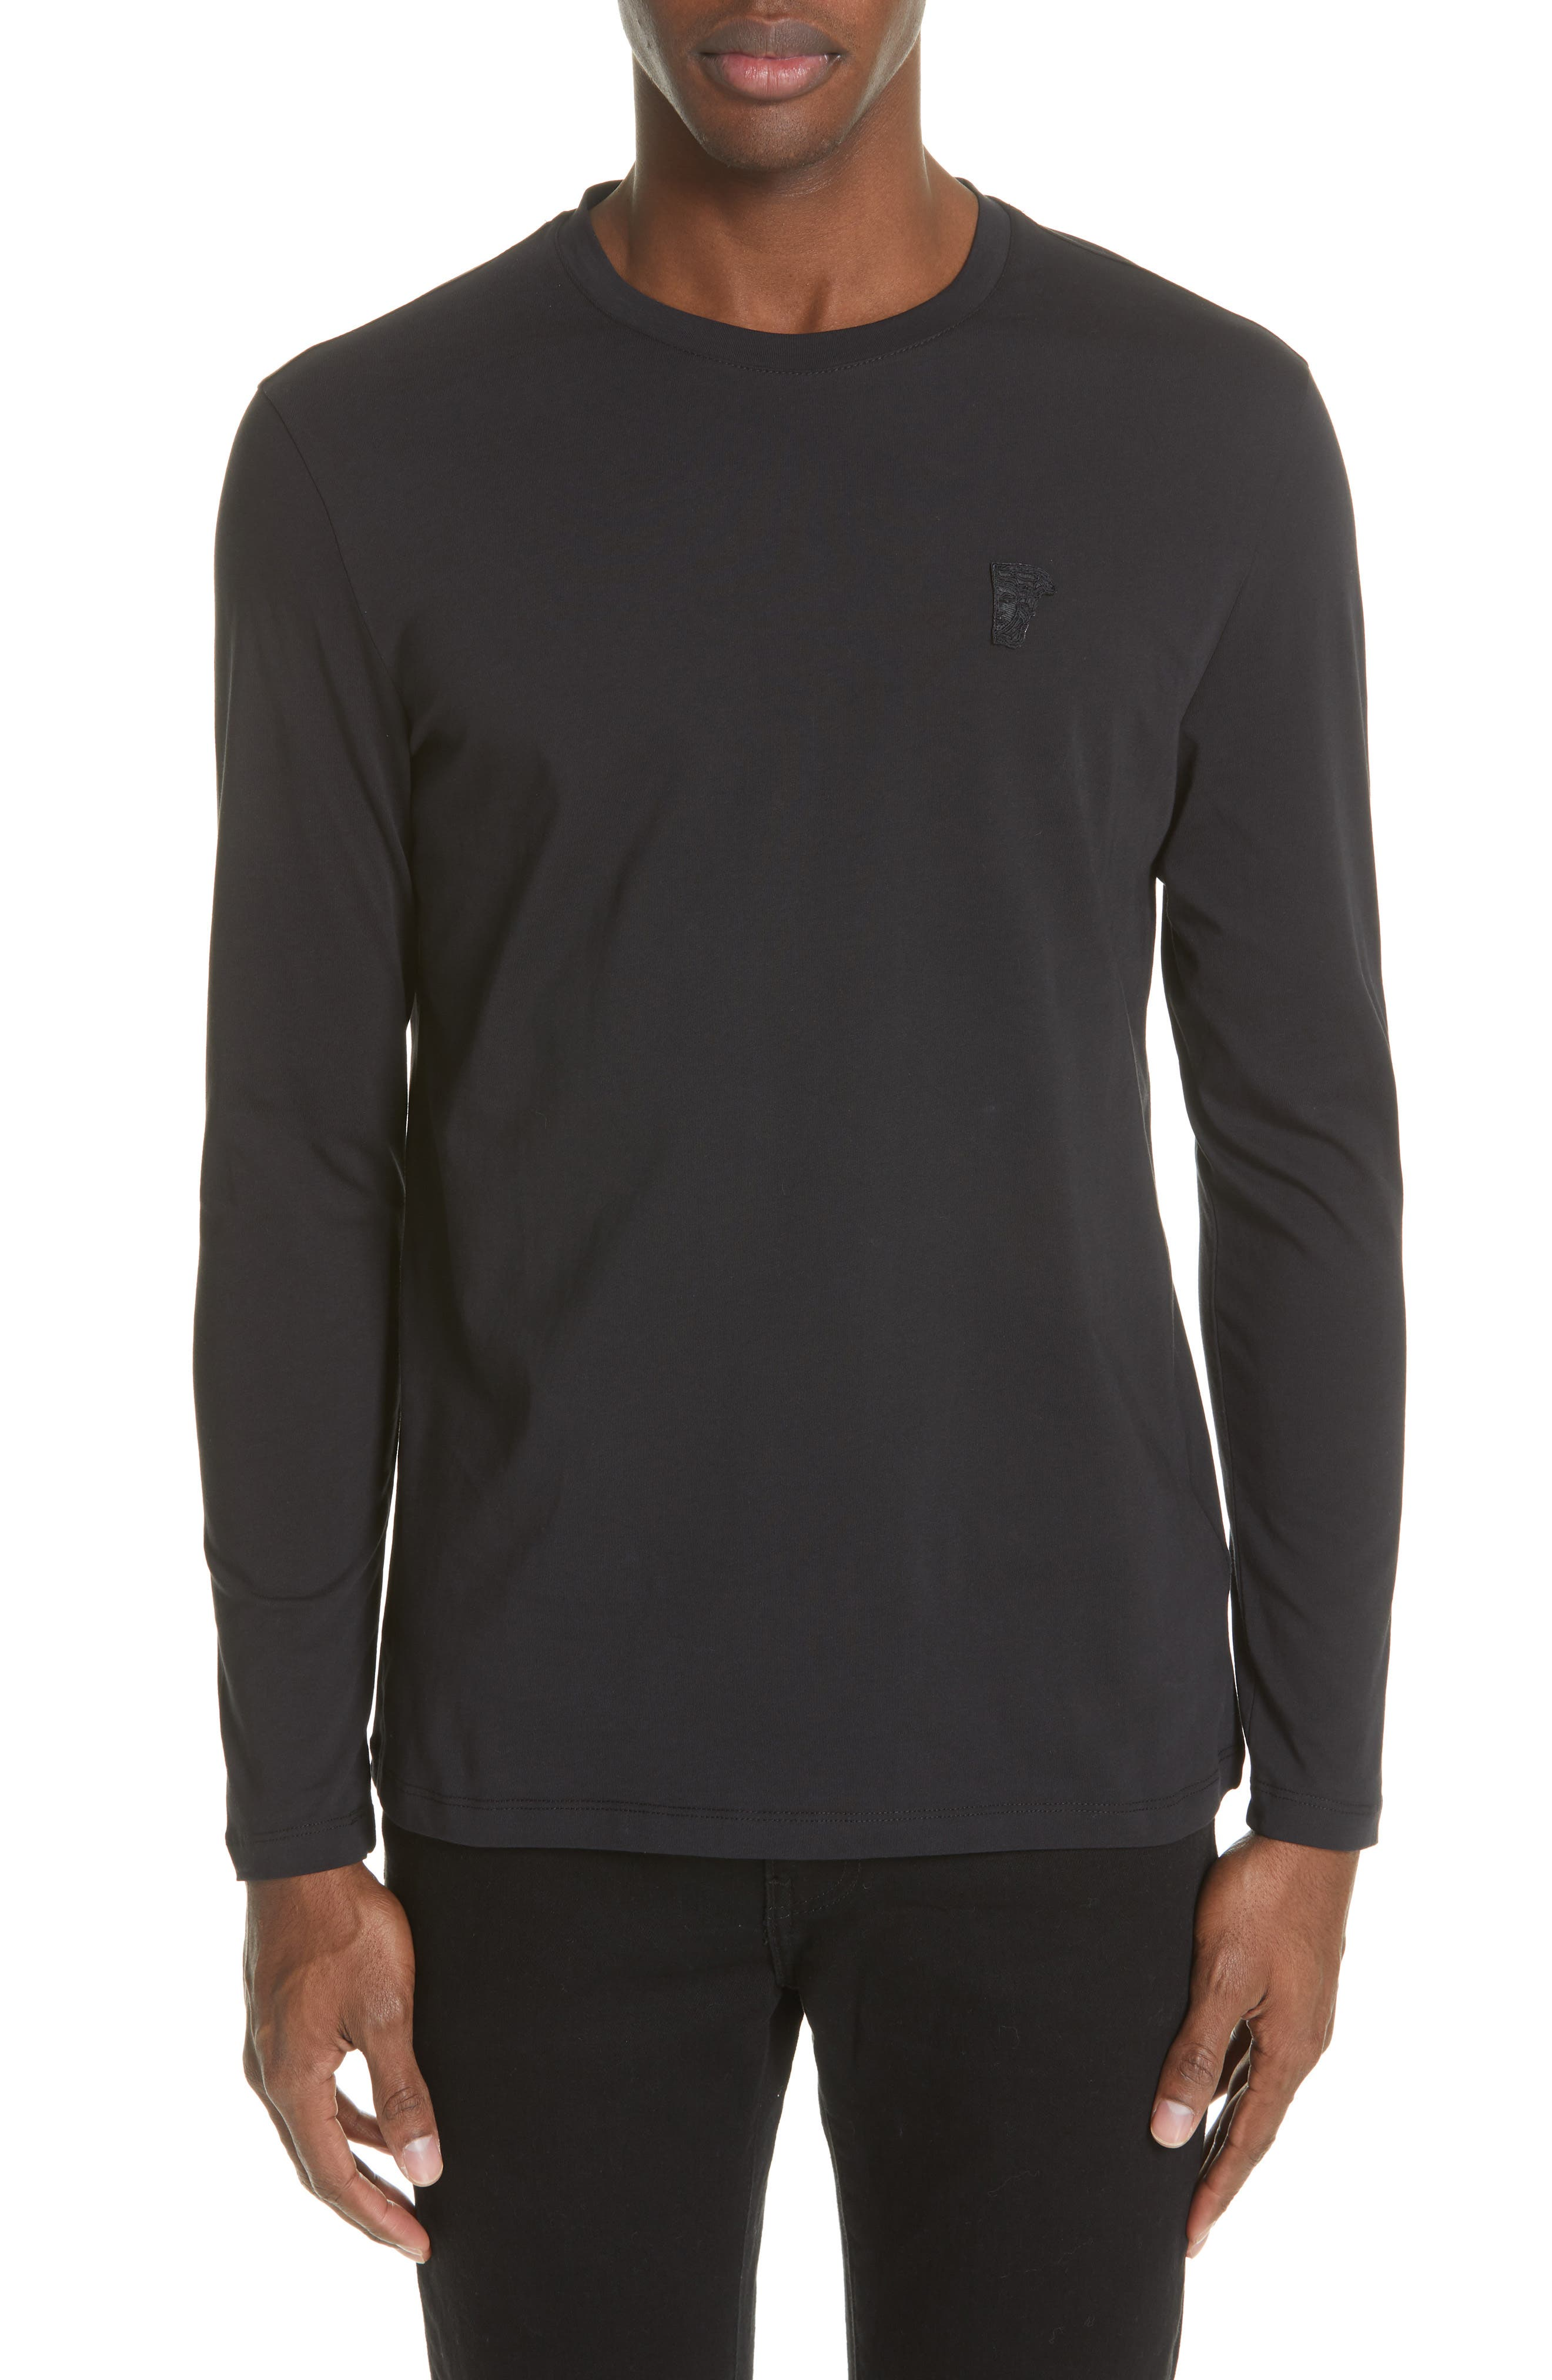 VERSACE COLLECTION Medusa Long Sleeve T-Shirt, Main, color, 001